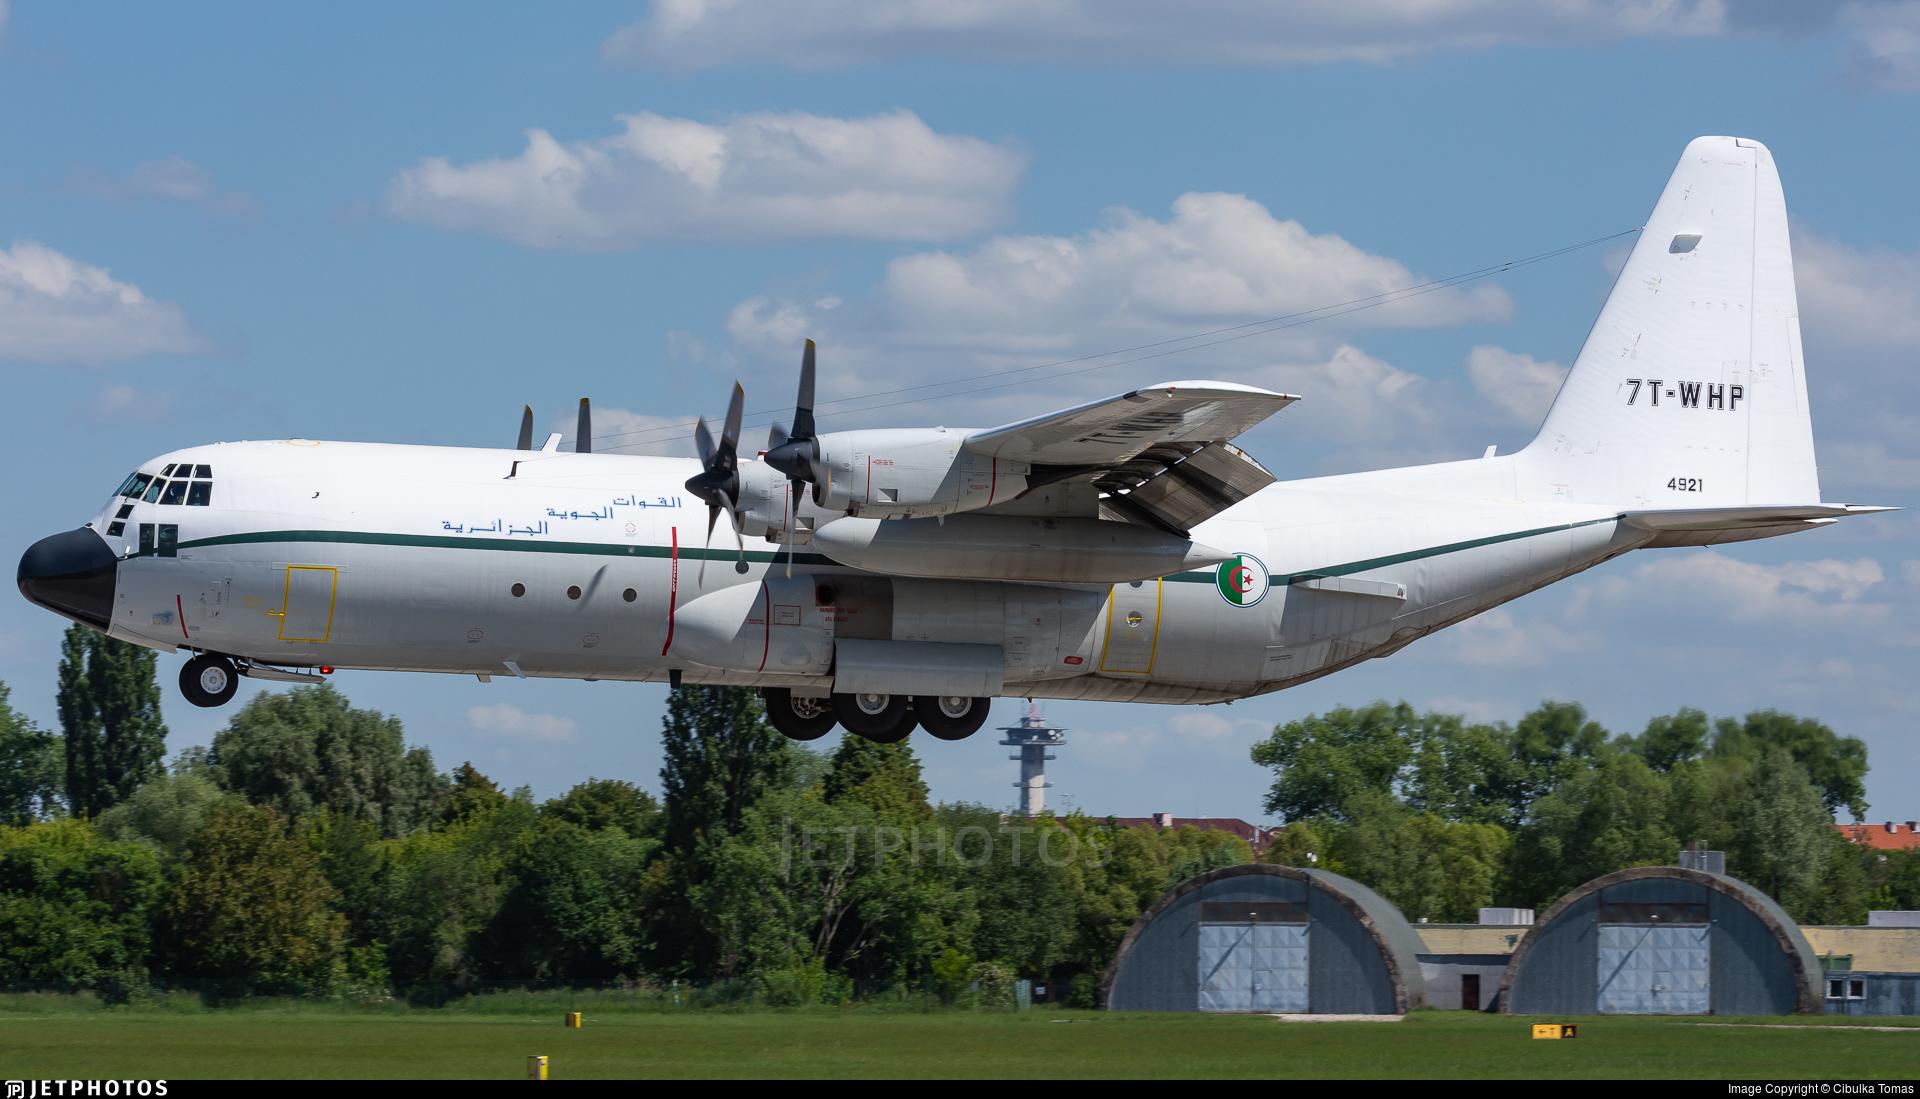 7T-WHP - Lockheed C-130H-30 Hercules - Algeria - Air Force